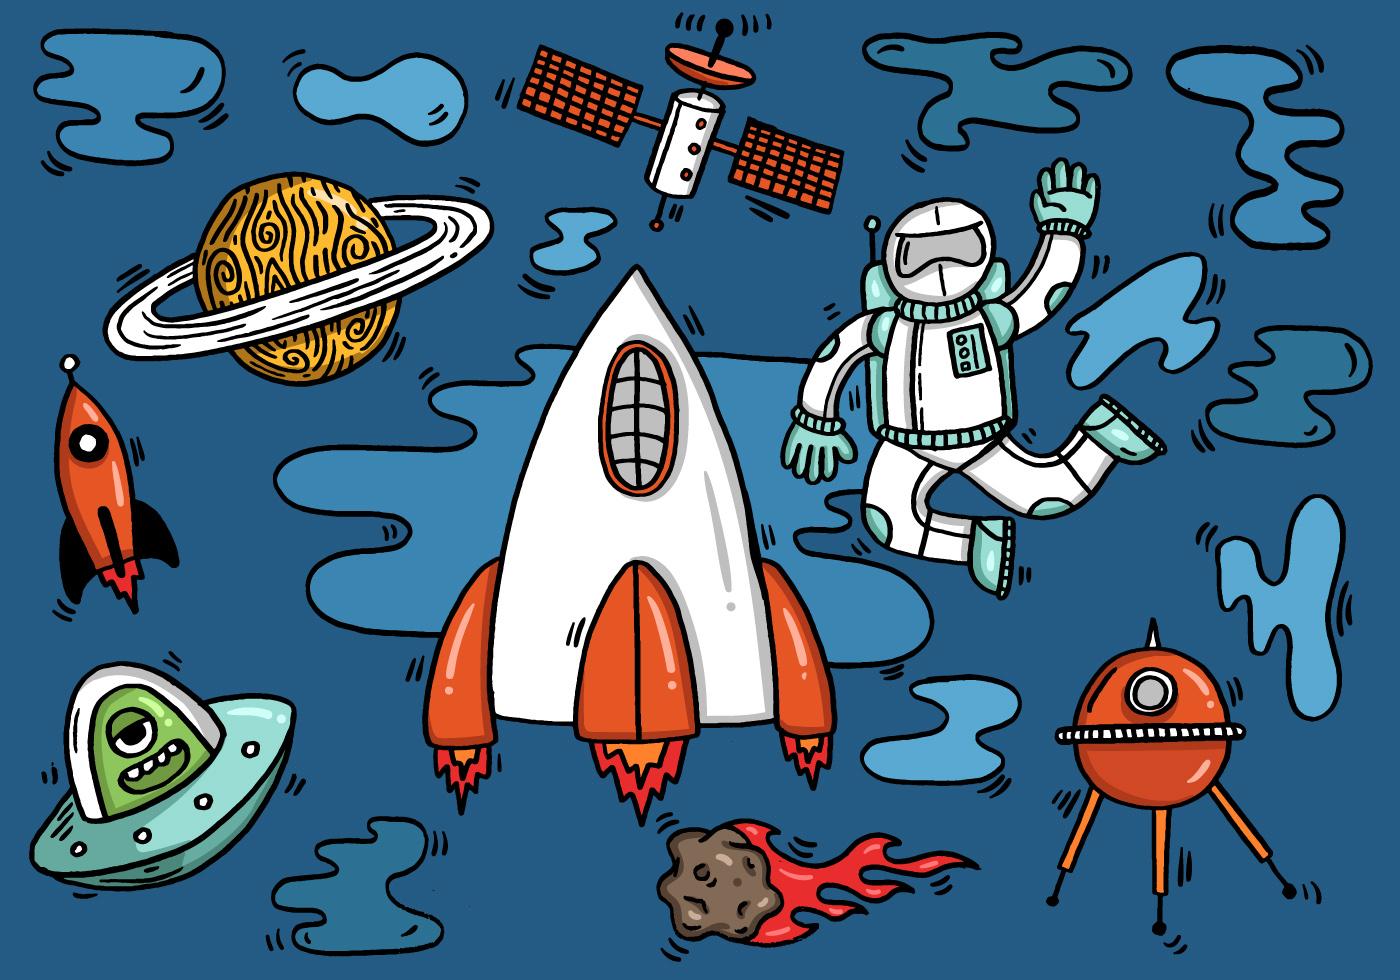 Spaceship Free Vector Art